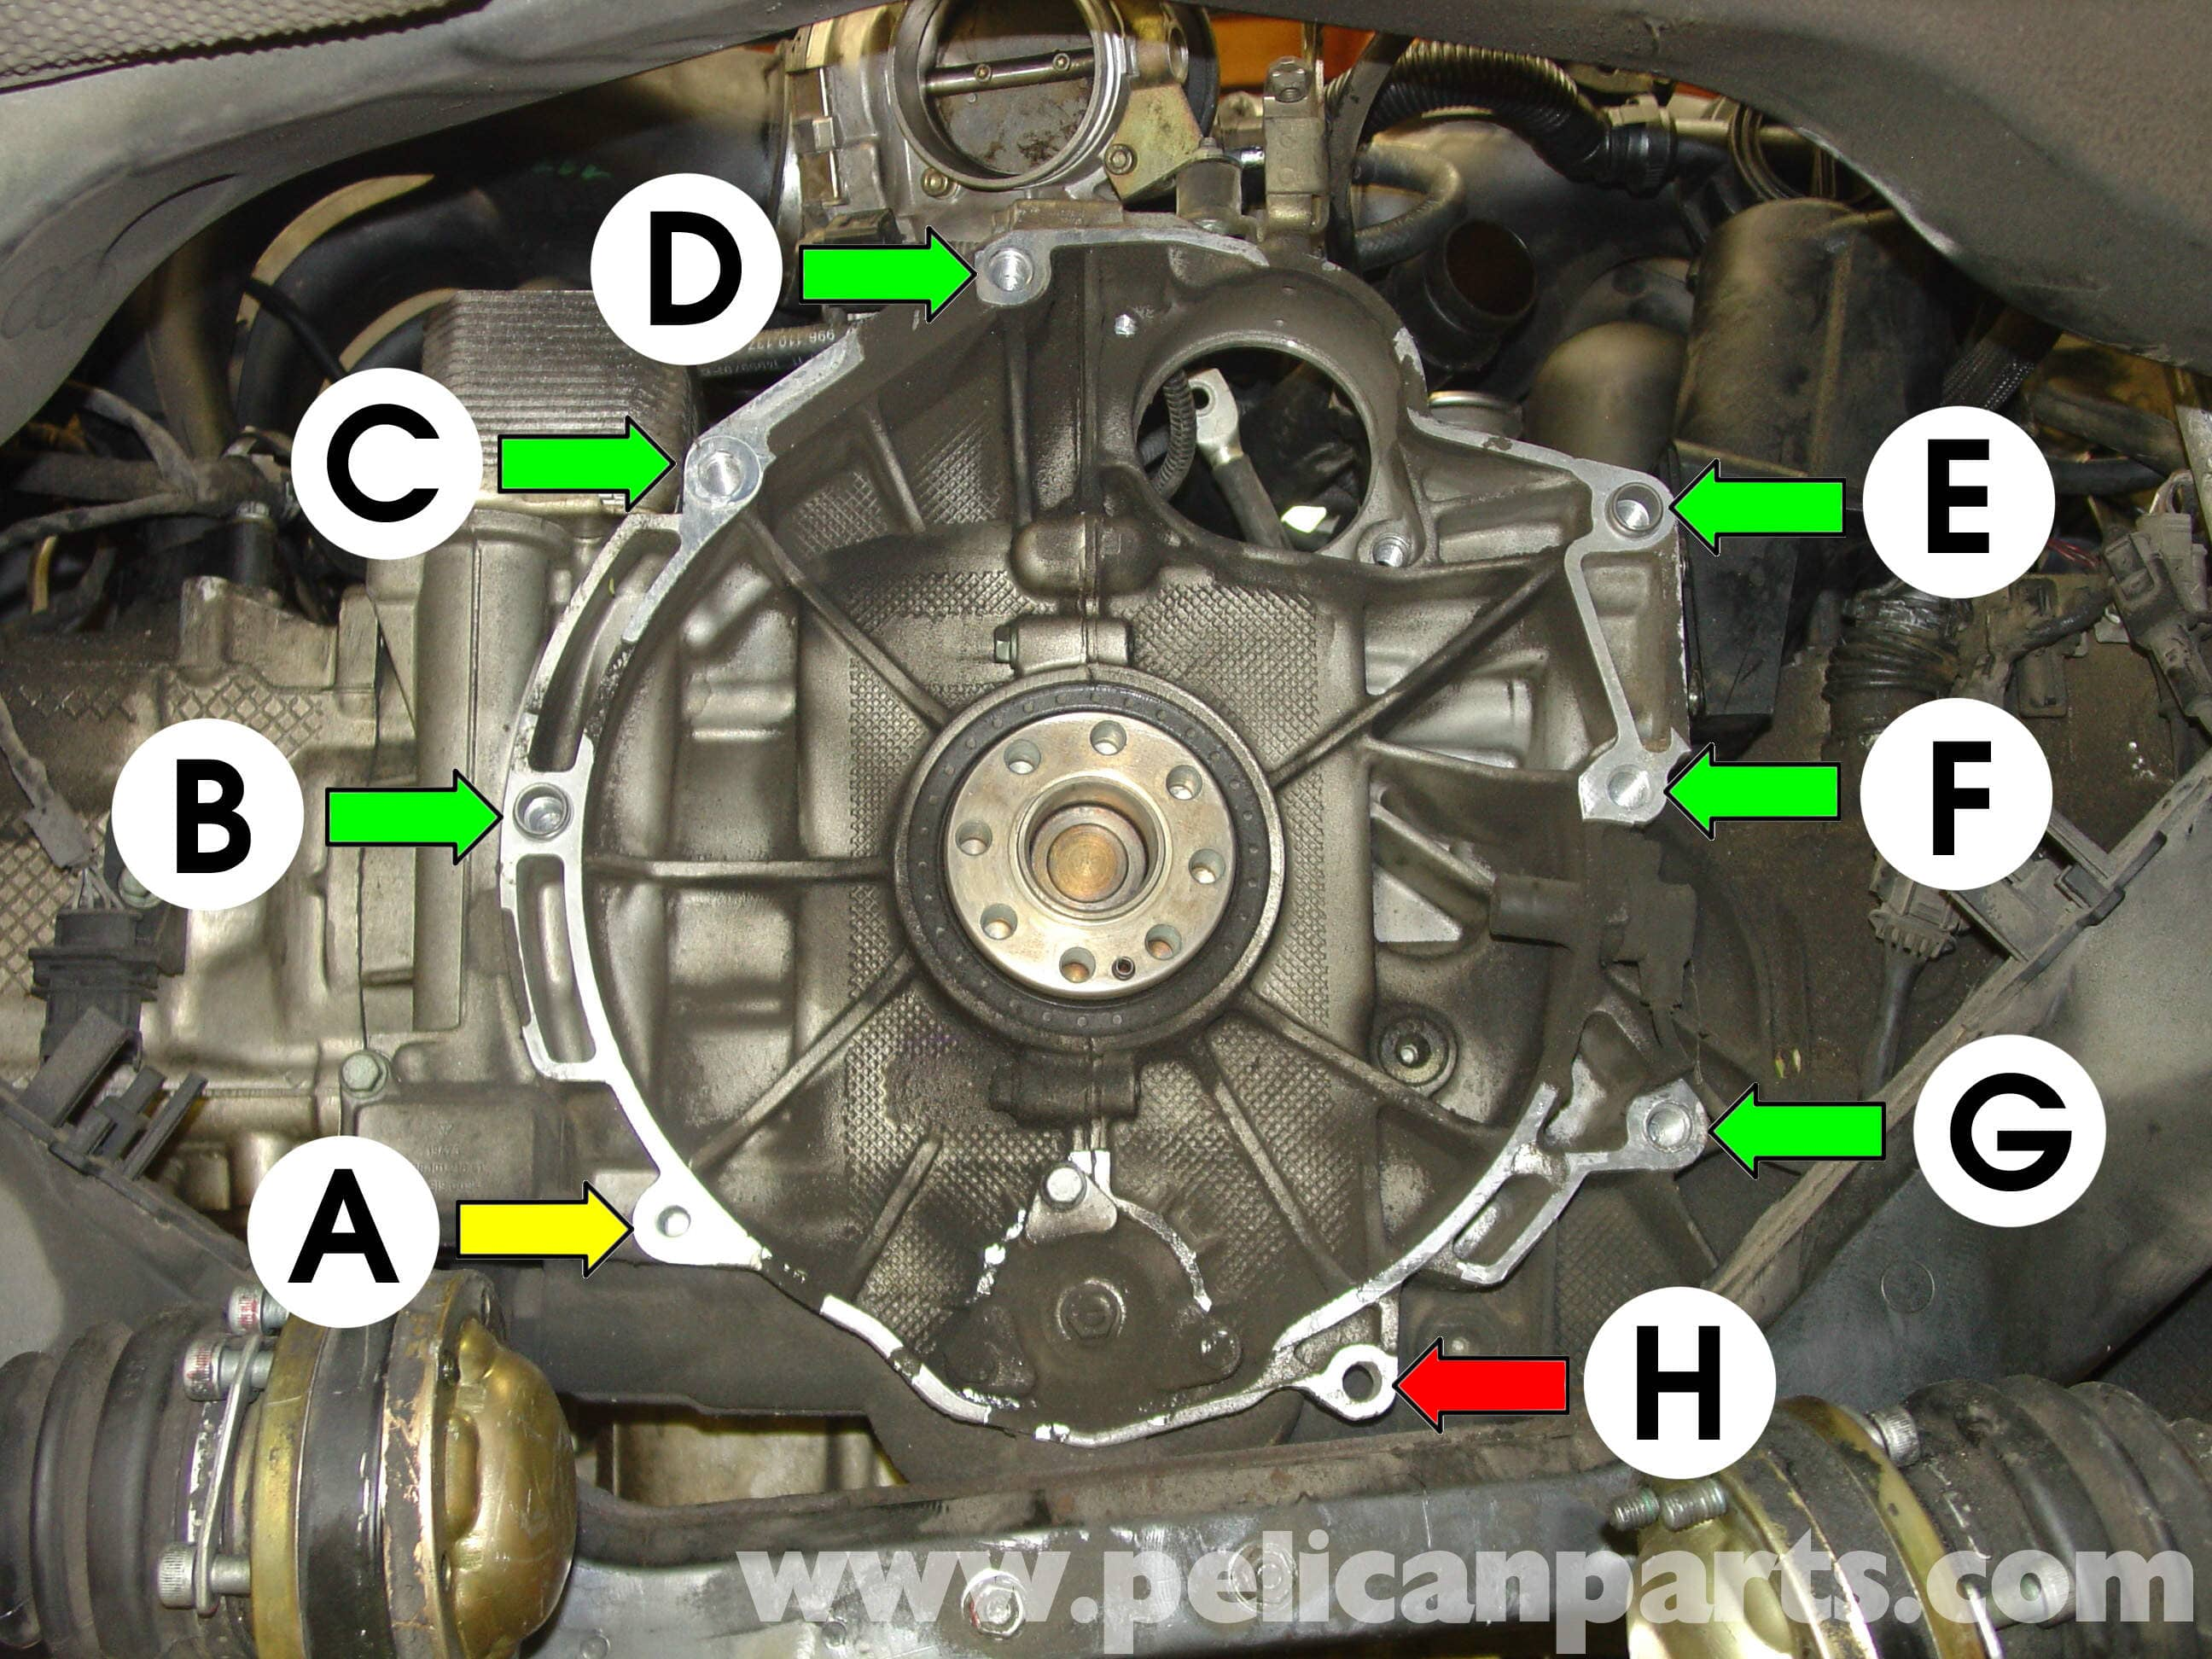 2003 Hyundai Tiburon Engine Wiring Diagram Porsche Boxster Transmission Removal 986 987 1997 08